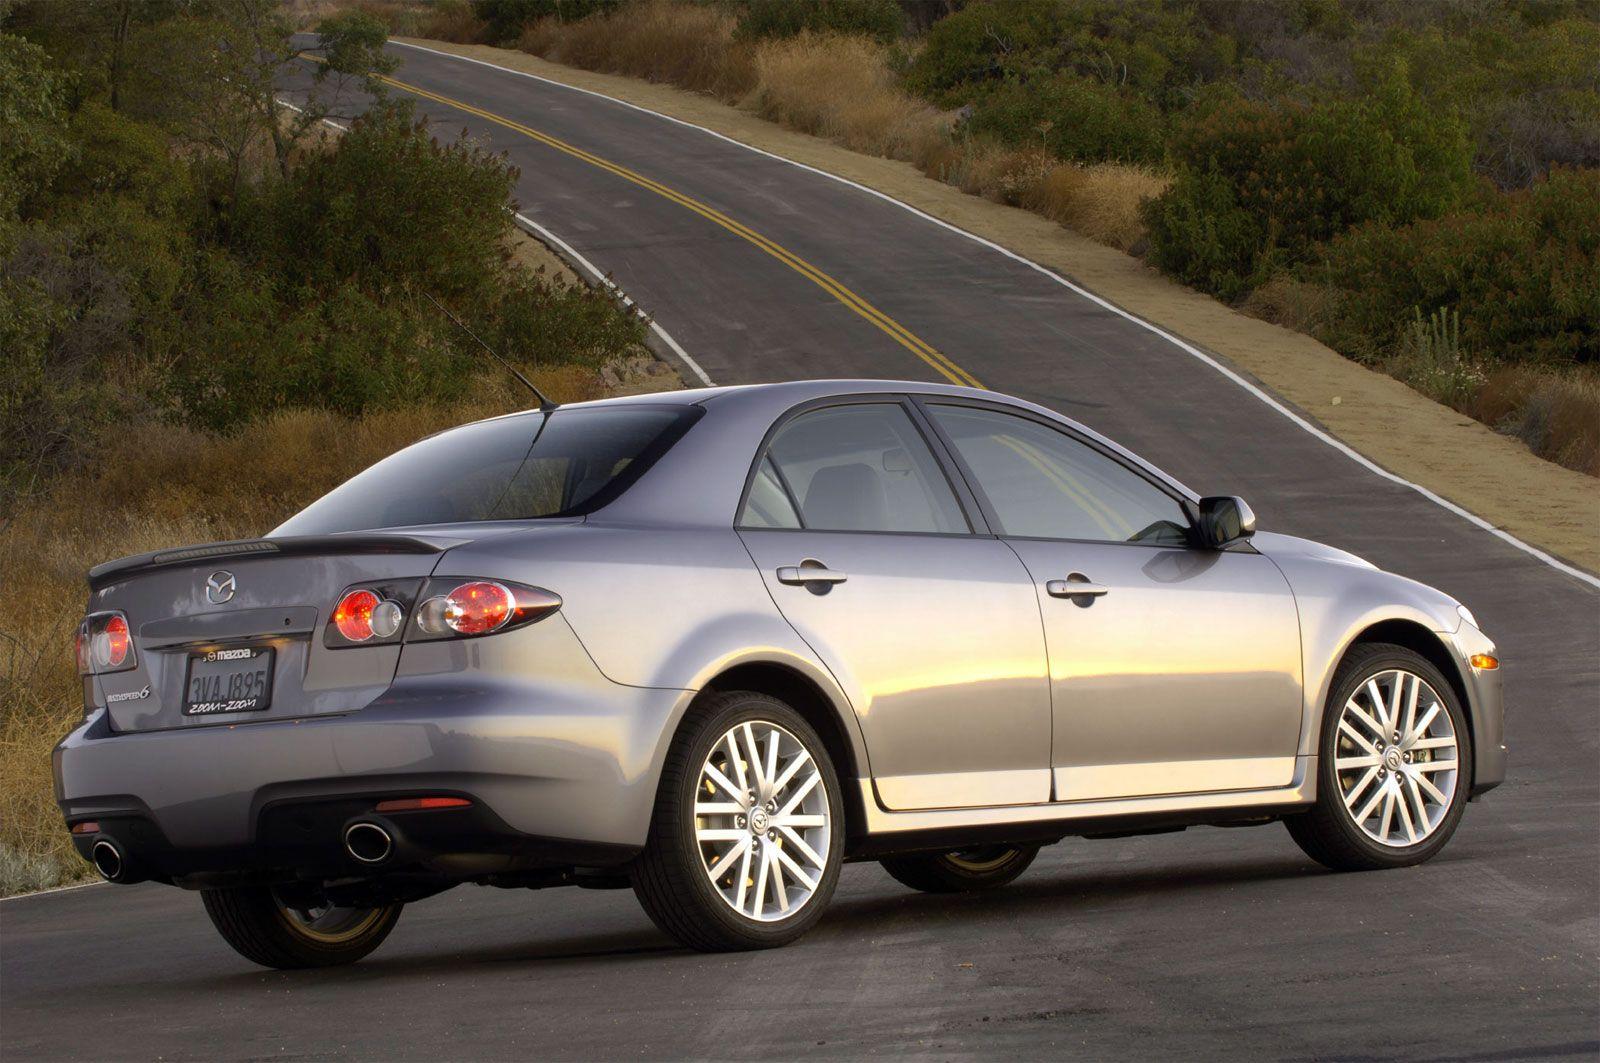 Pin by Syed Ahmed on 20022008 Mazda 6 Mazda 6, Mazda